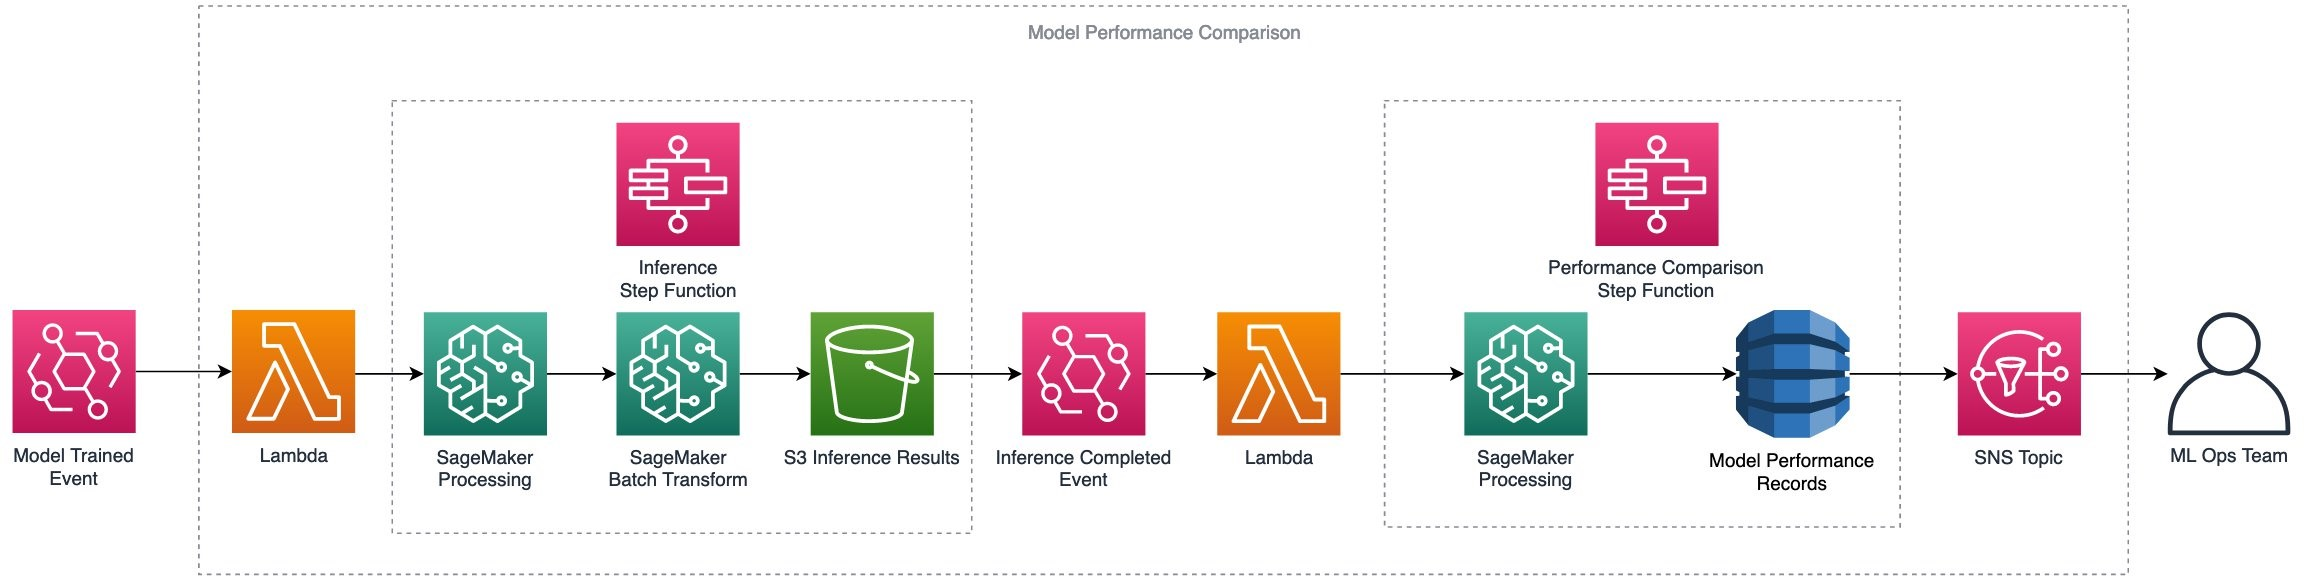 Model performance comparison workflow